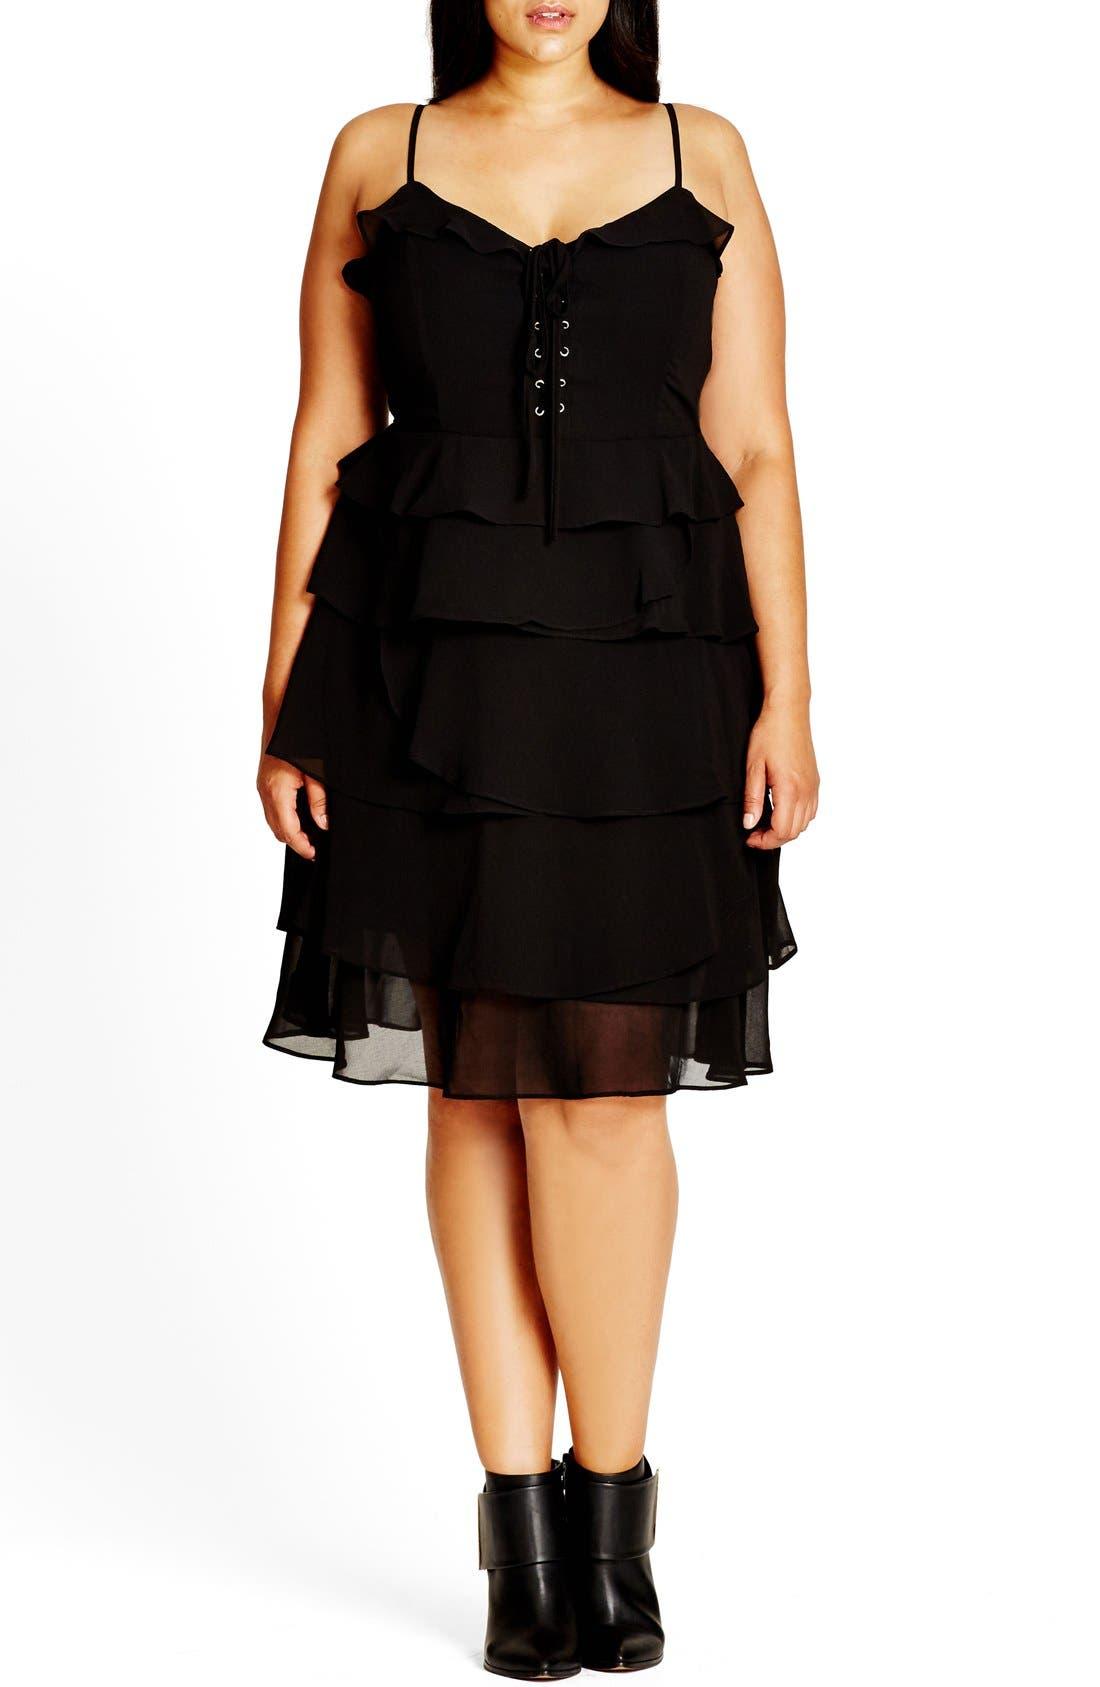 Main Image - City Chic Lace-Up Ruffle Fit & Flare Dress (Plus Size)